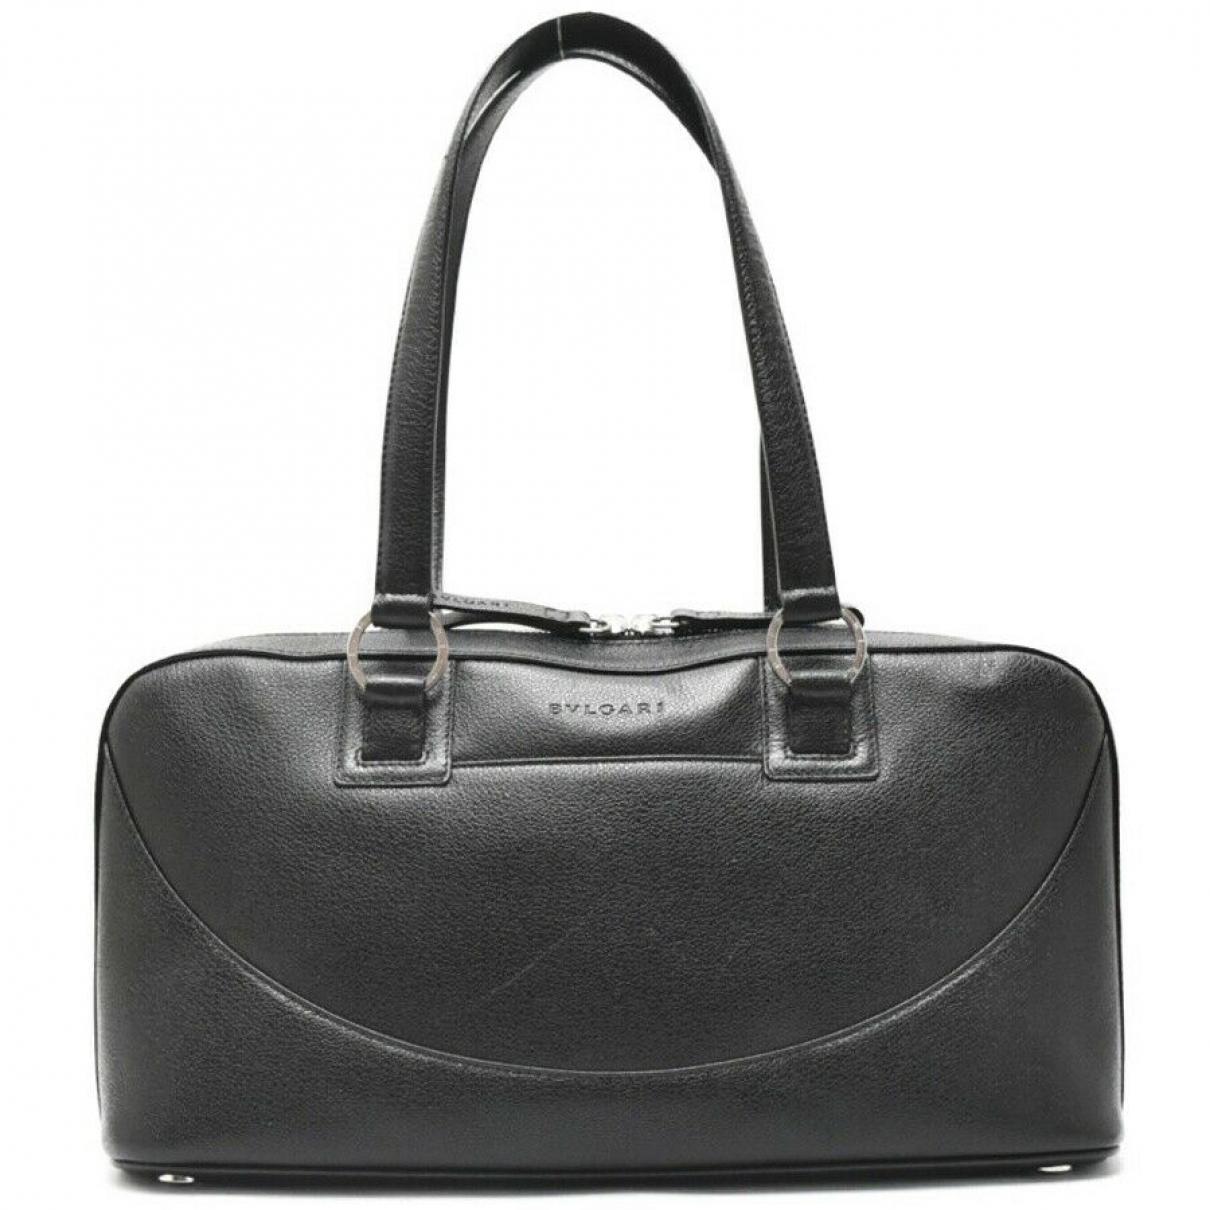 Bvlgari N Leather Travel bag for Women N